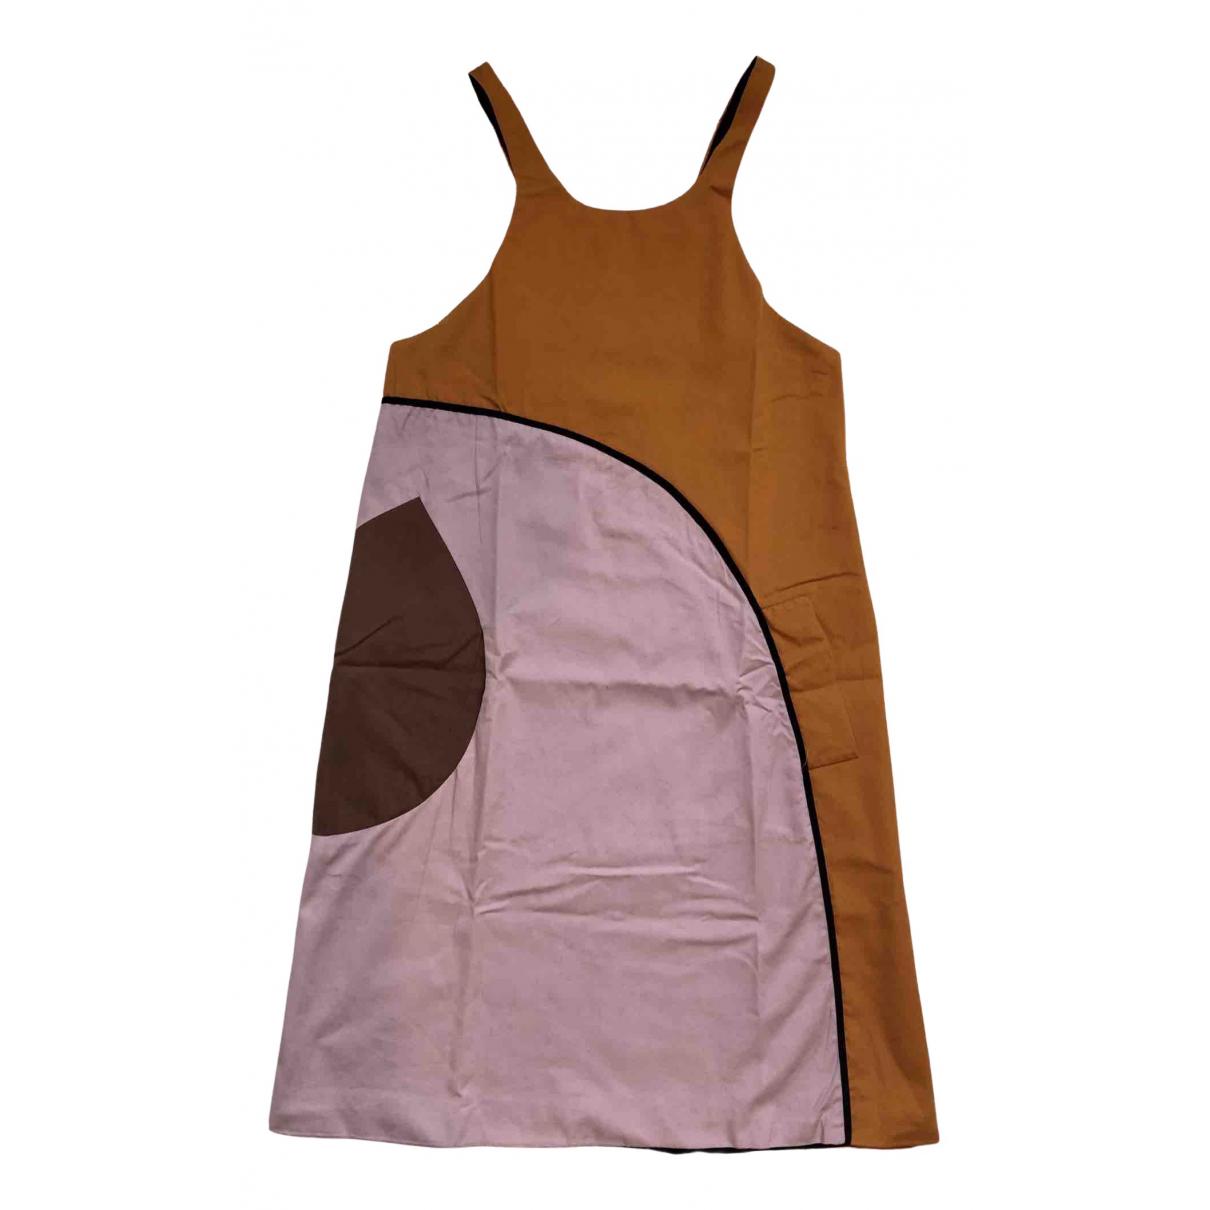 Marni N Multicolour Cotton dress for Women 38 IT